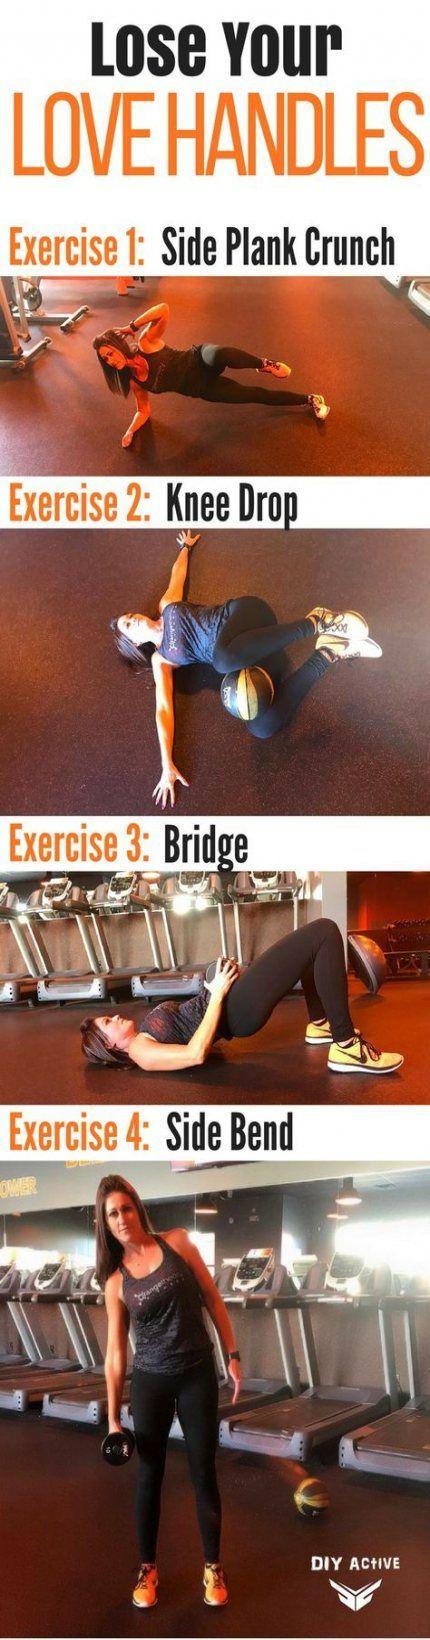 Fitness motivation curvy healthy 56+  Ideas #motivation #fitness